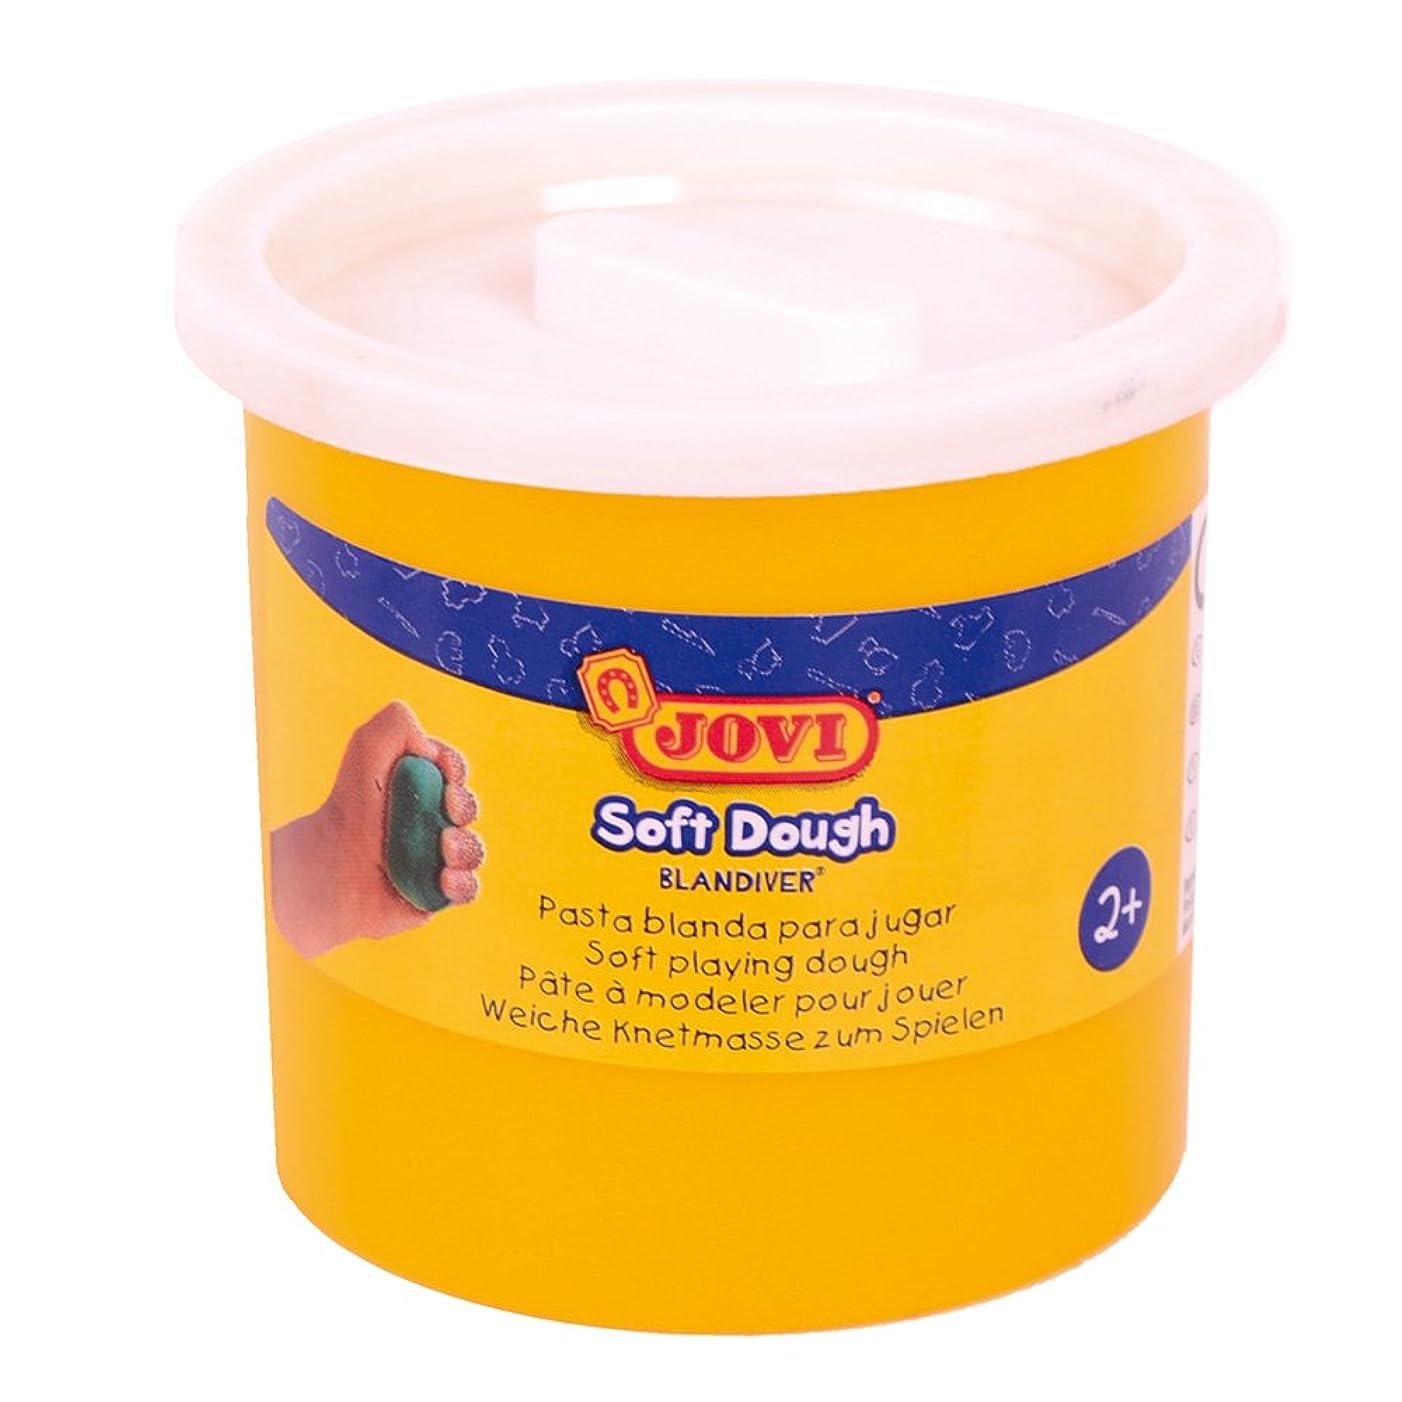 Jovi?–?Soft Dough blandiver, Case of 5?Jars, 110?g, White (45001)